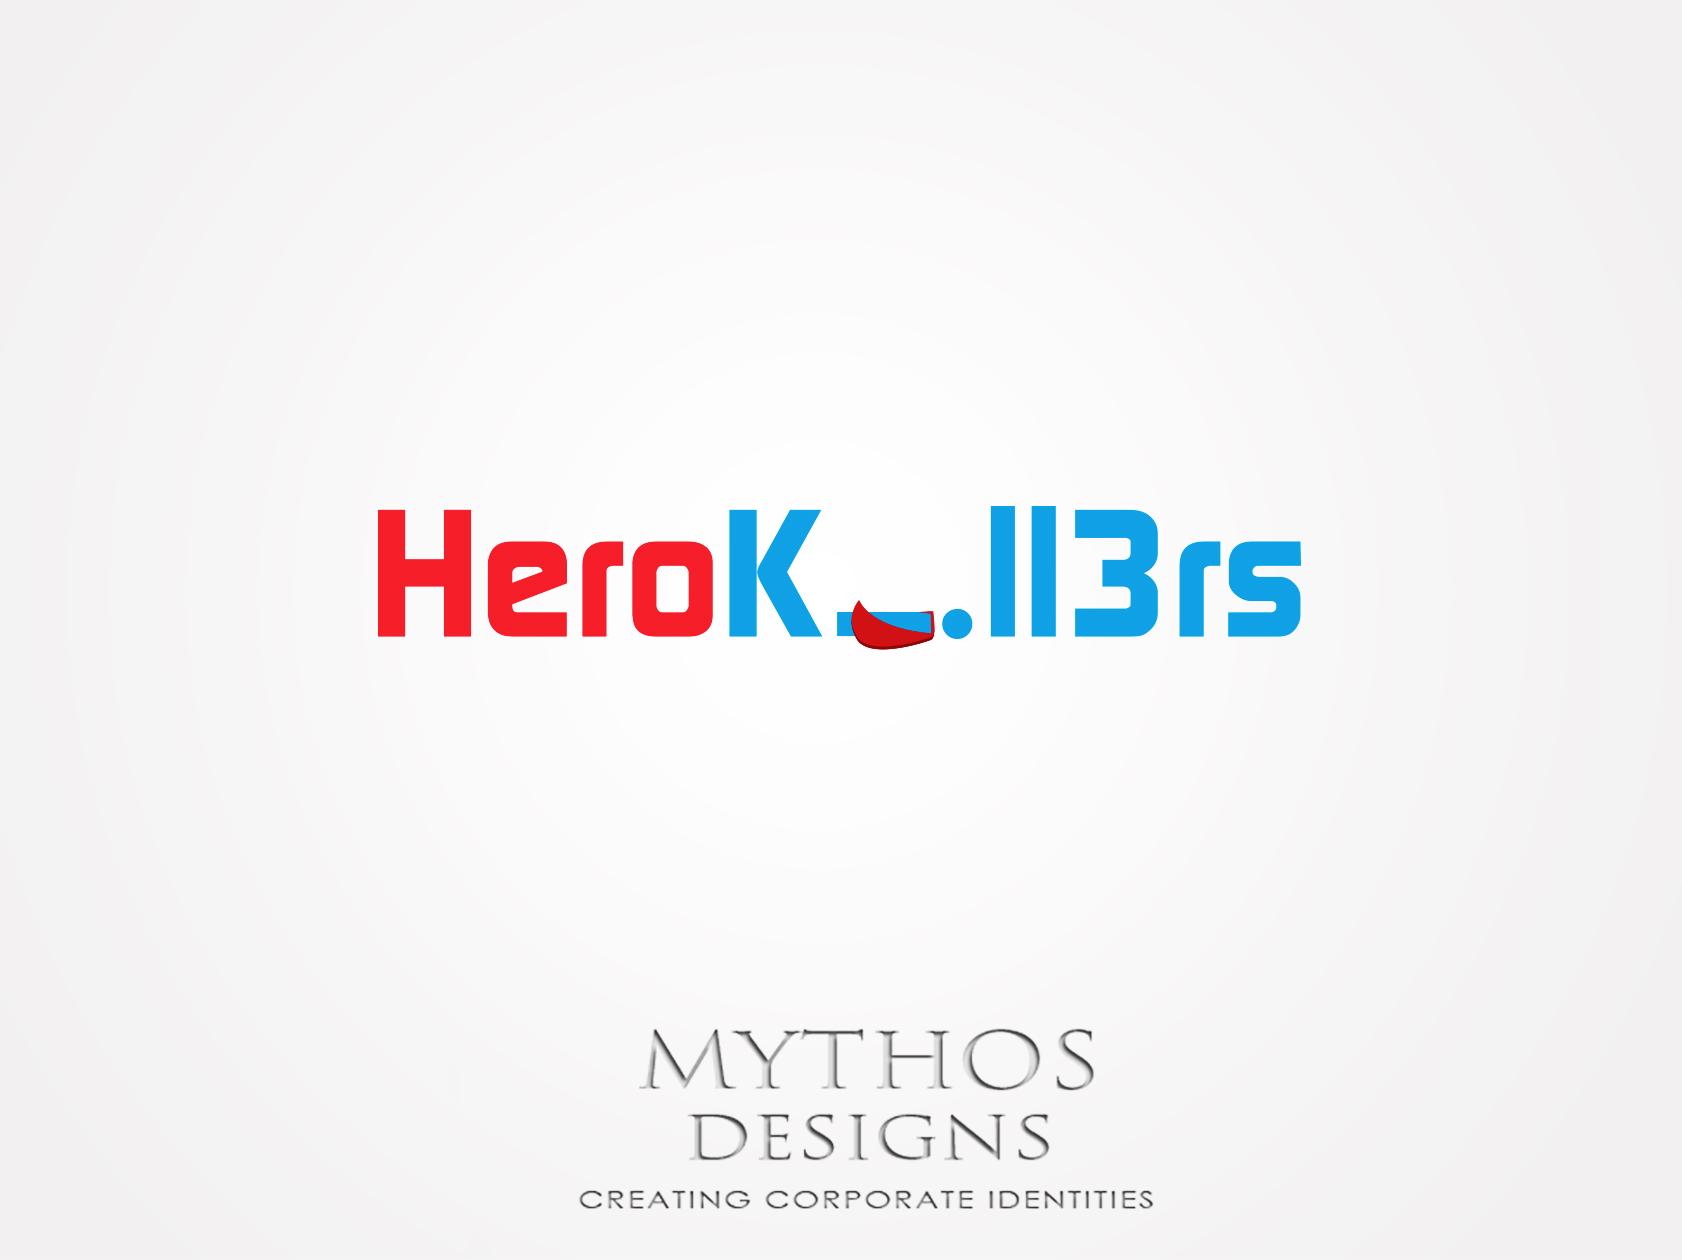 Logo Design by Mythos Designs - Entry No. 7 in the Logo Design Contest Fun Logo Design for HeroKill3rs.